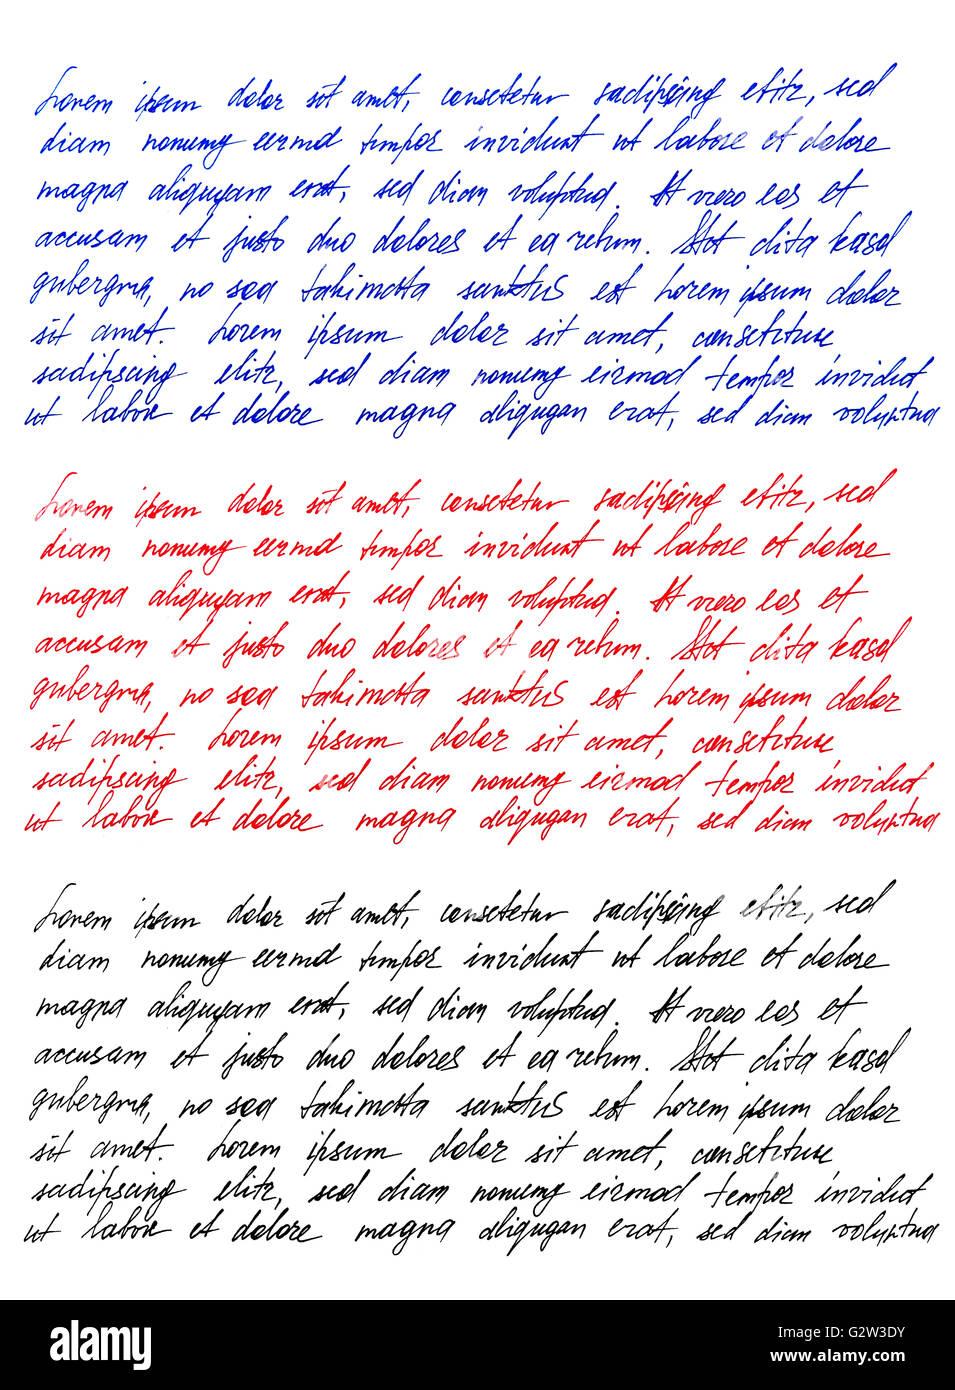 Handwritten letter. Latin text Lorem ipsum. Handwriting. Calligraphy. Manuscript. Script. Font. Abstract texture - Stock Image